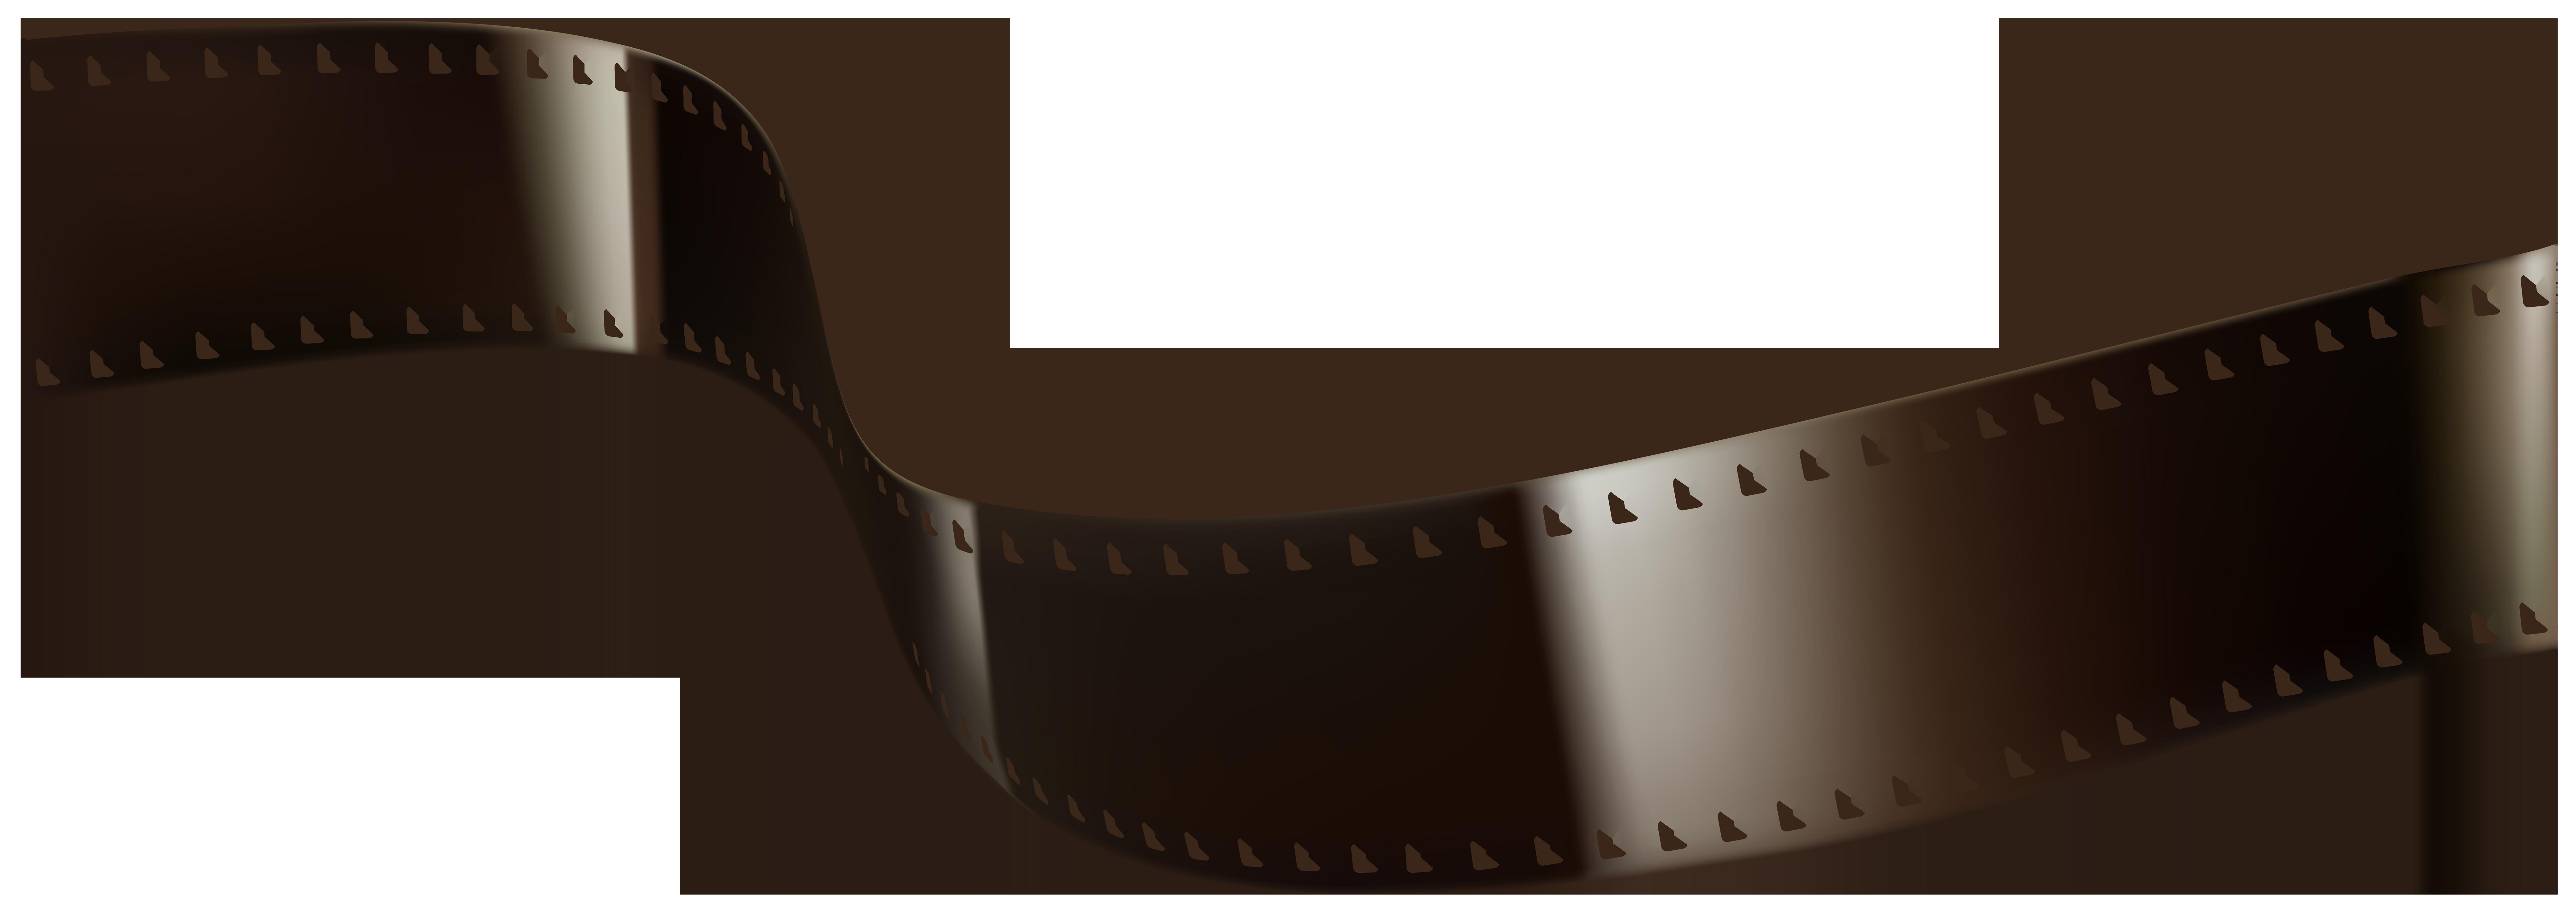 Cinema clipart file. Filmstrip png clip art